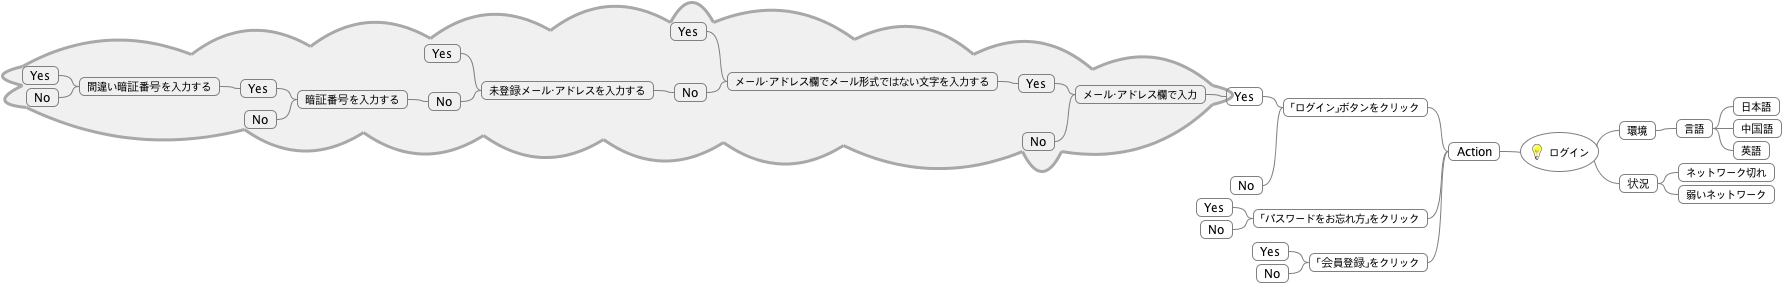 mindmap3.png